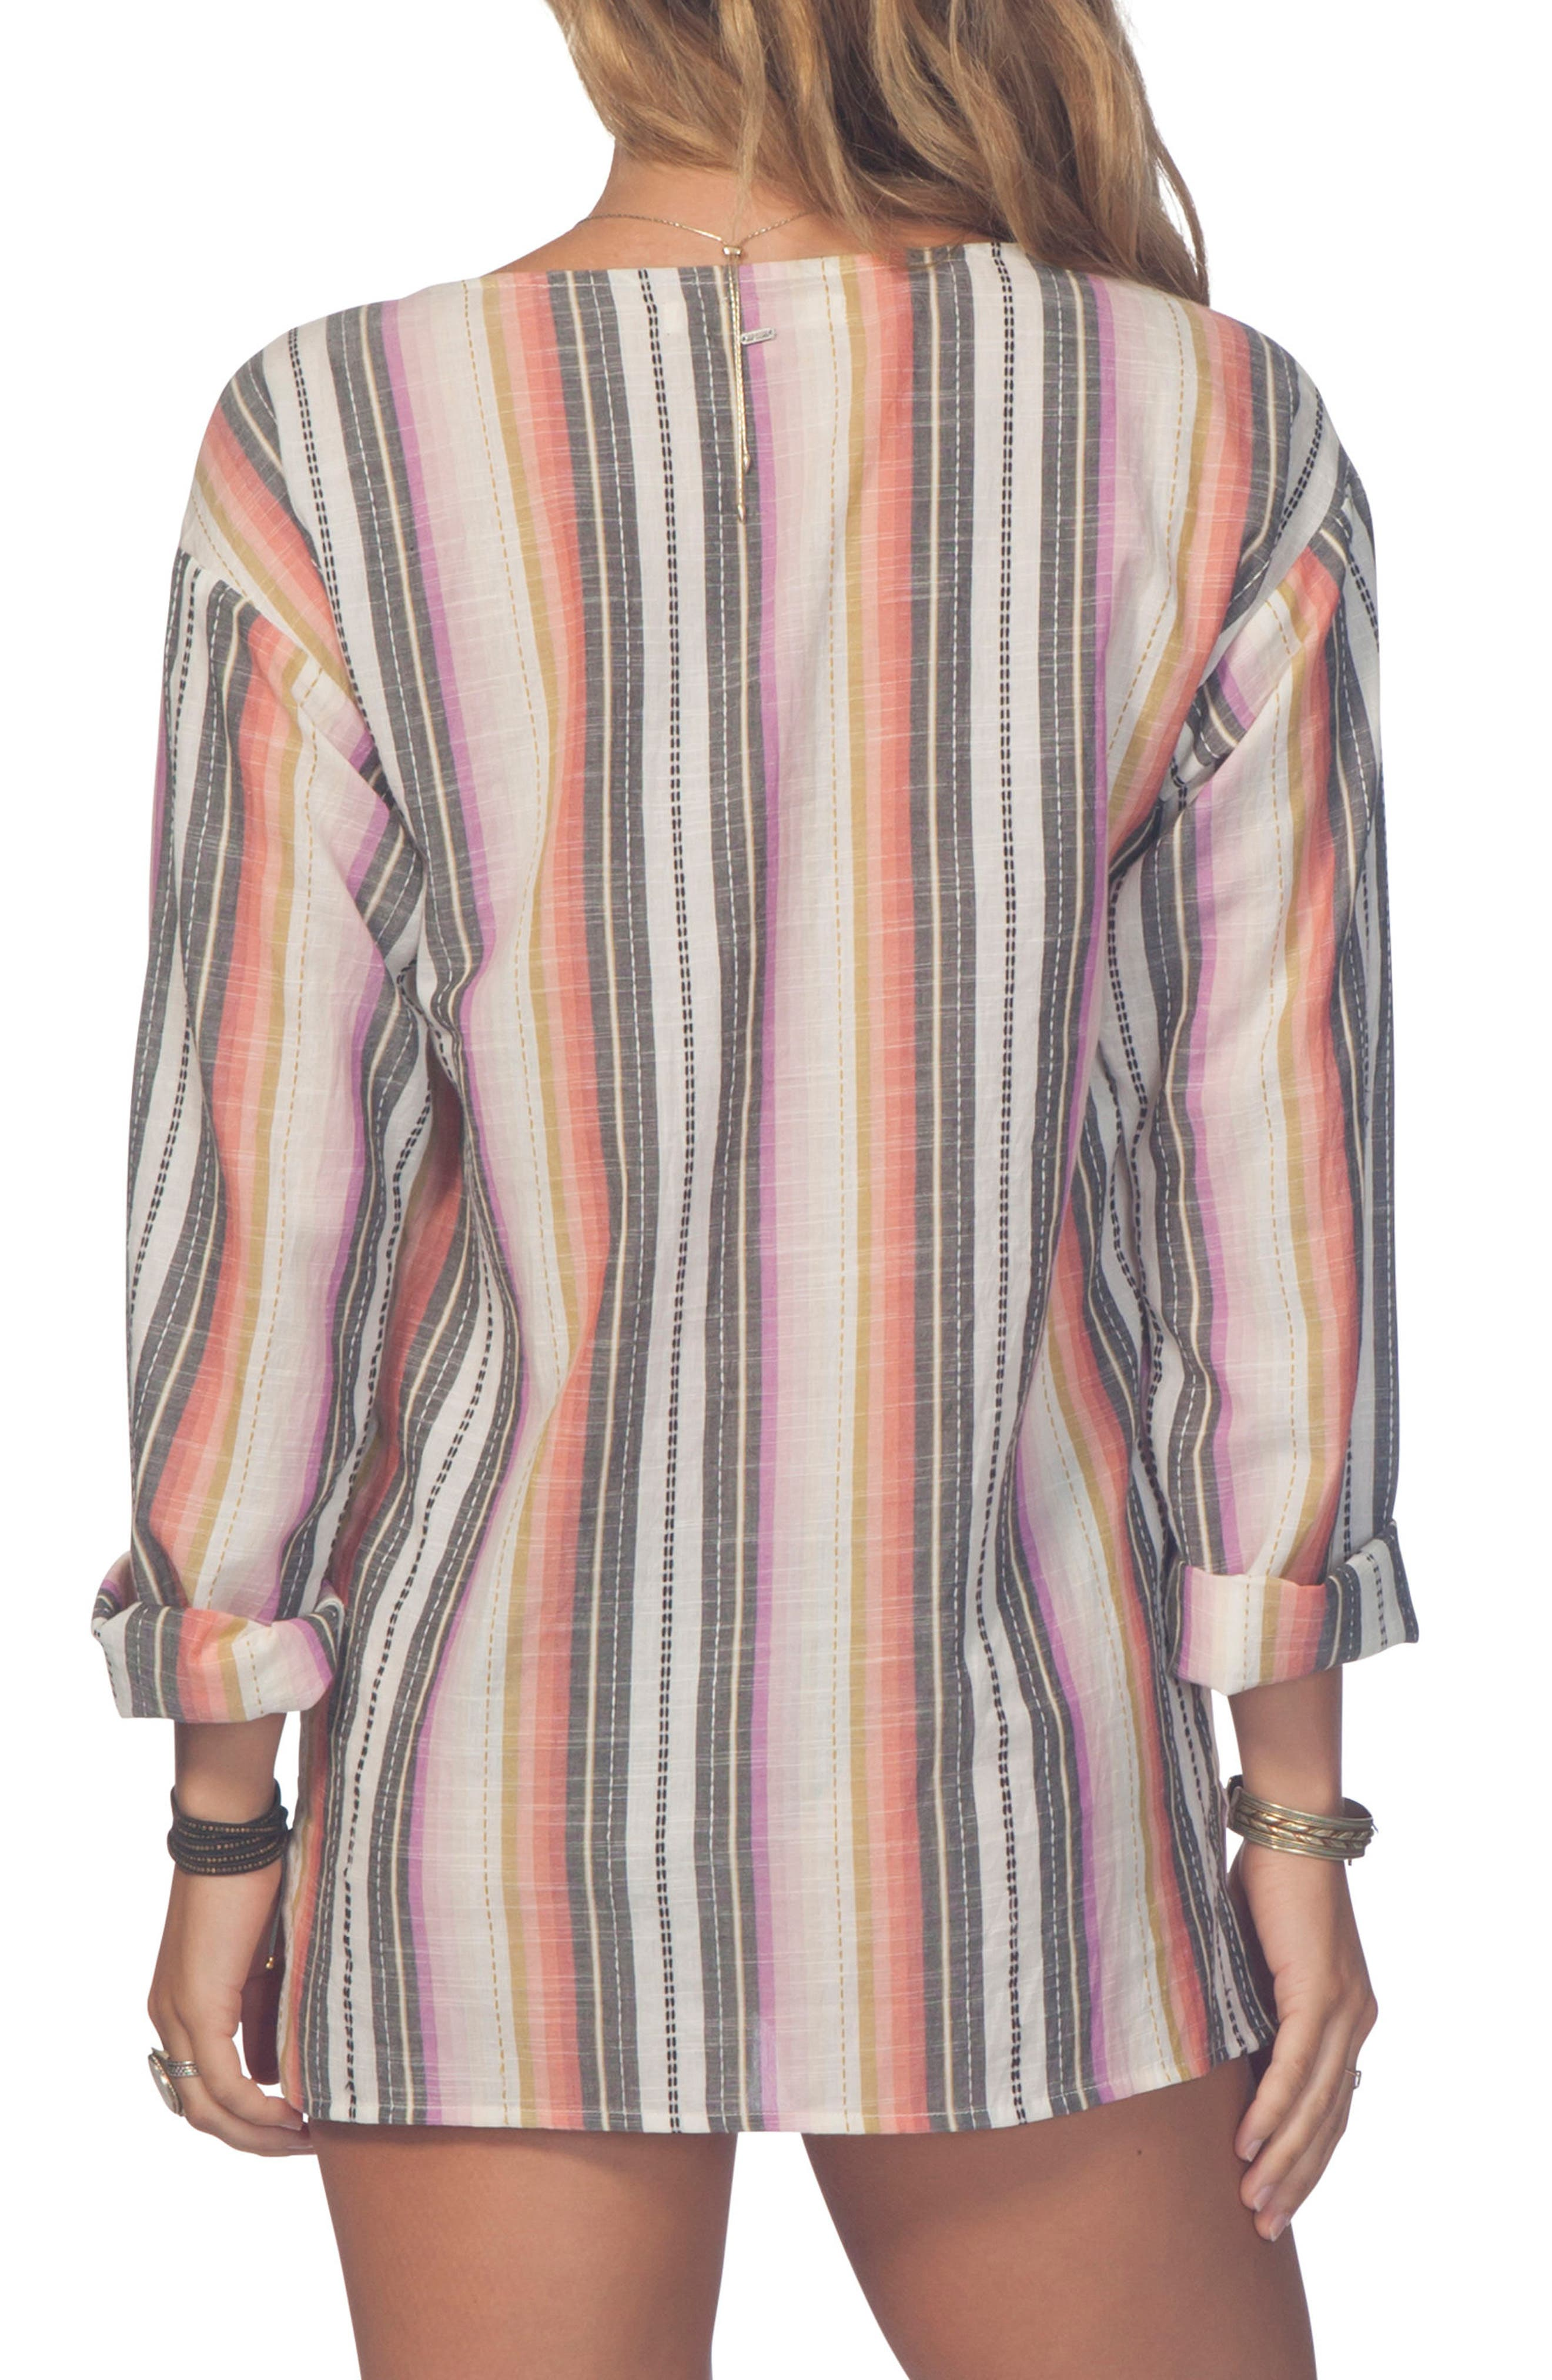 Sayulita Stripe Poncho Top,                             Alternate thumbnail 2, color,